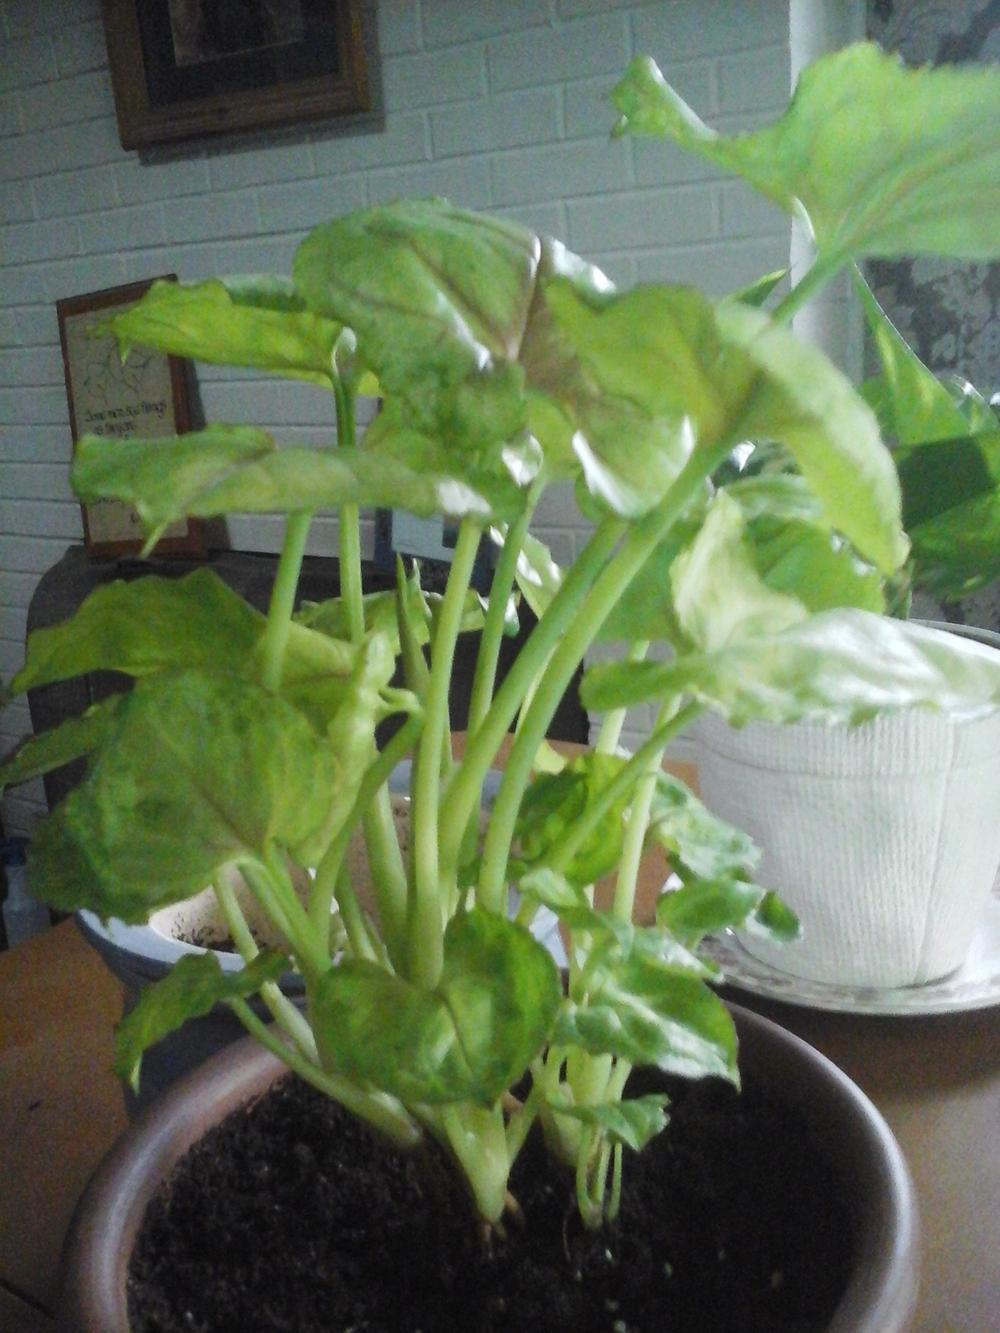 Best Kitchen Gallery: Plant Id Forum Arrowhead Plant Syngonium Podophyllum 'pink of Arrowhead House Plant Names on rachelxblog.com